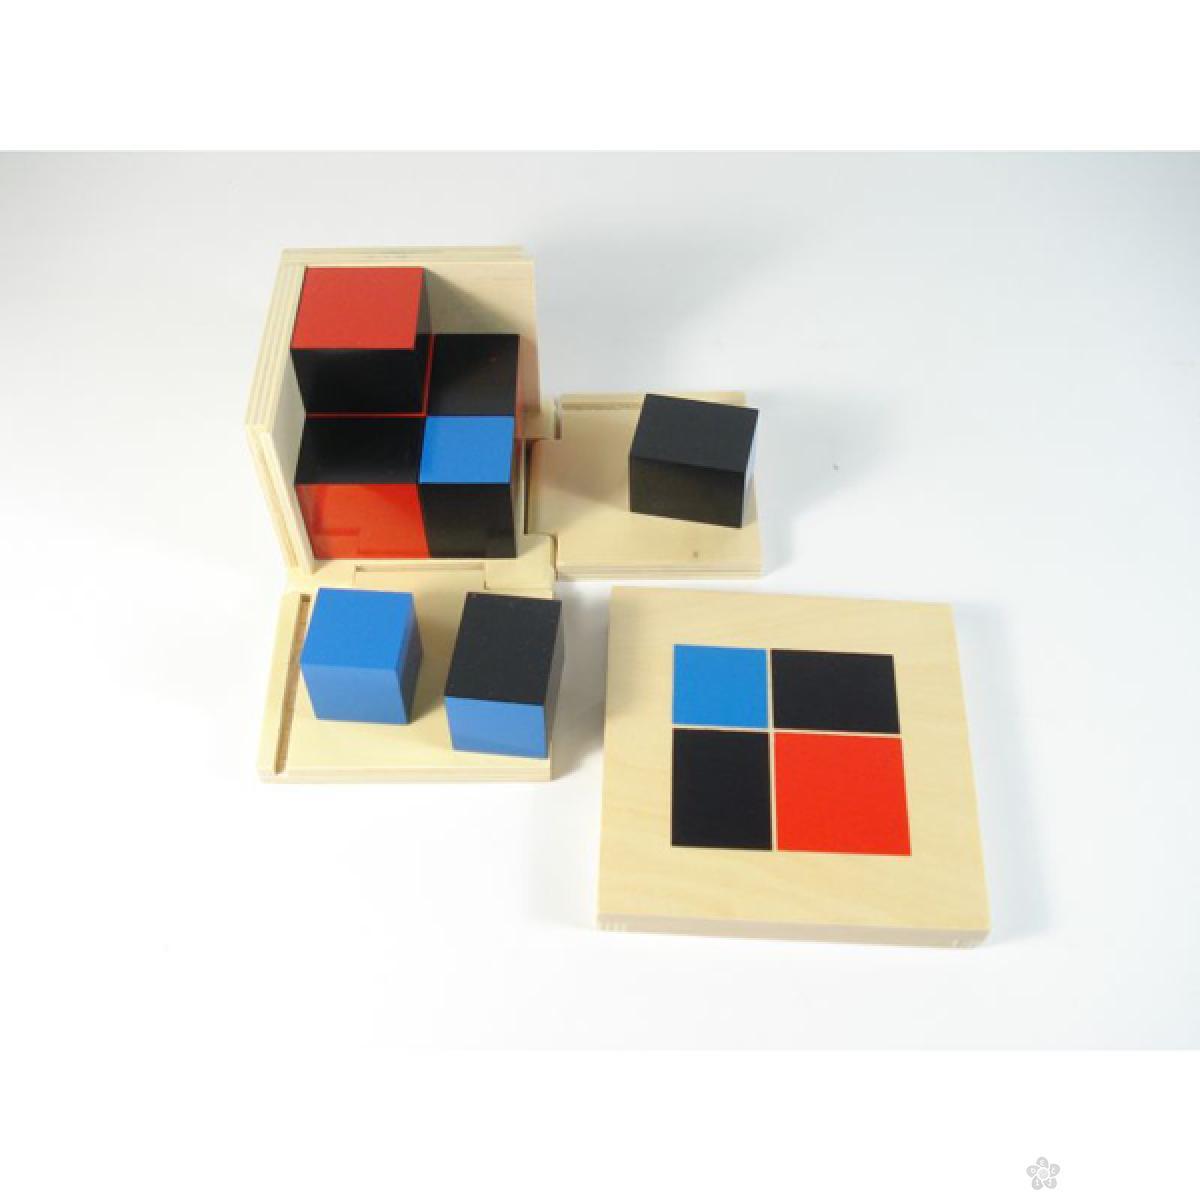 Montesori-kocka 2 x 2, HTM0174